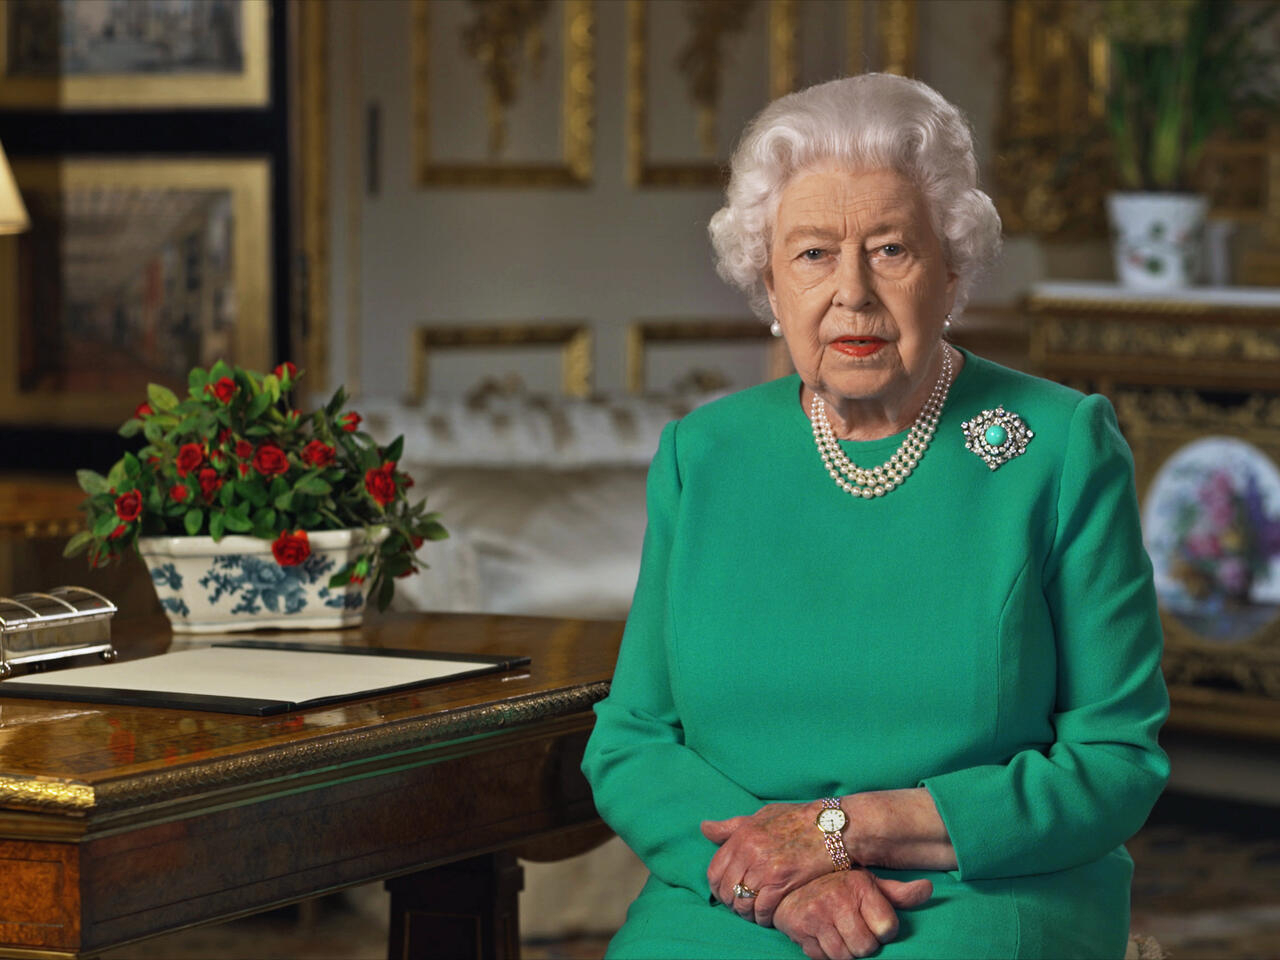 The Queen On Christmas Day 2021 In Rare Address Queen Elizabeth Calls For Self Discipline In Coronavirus Fight